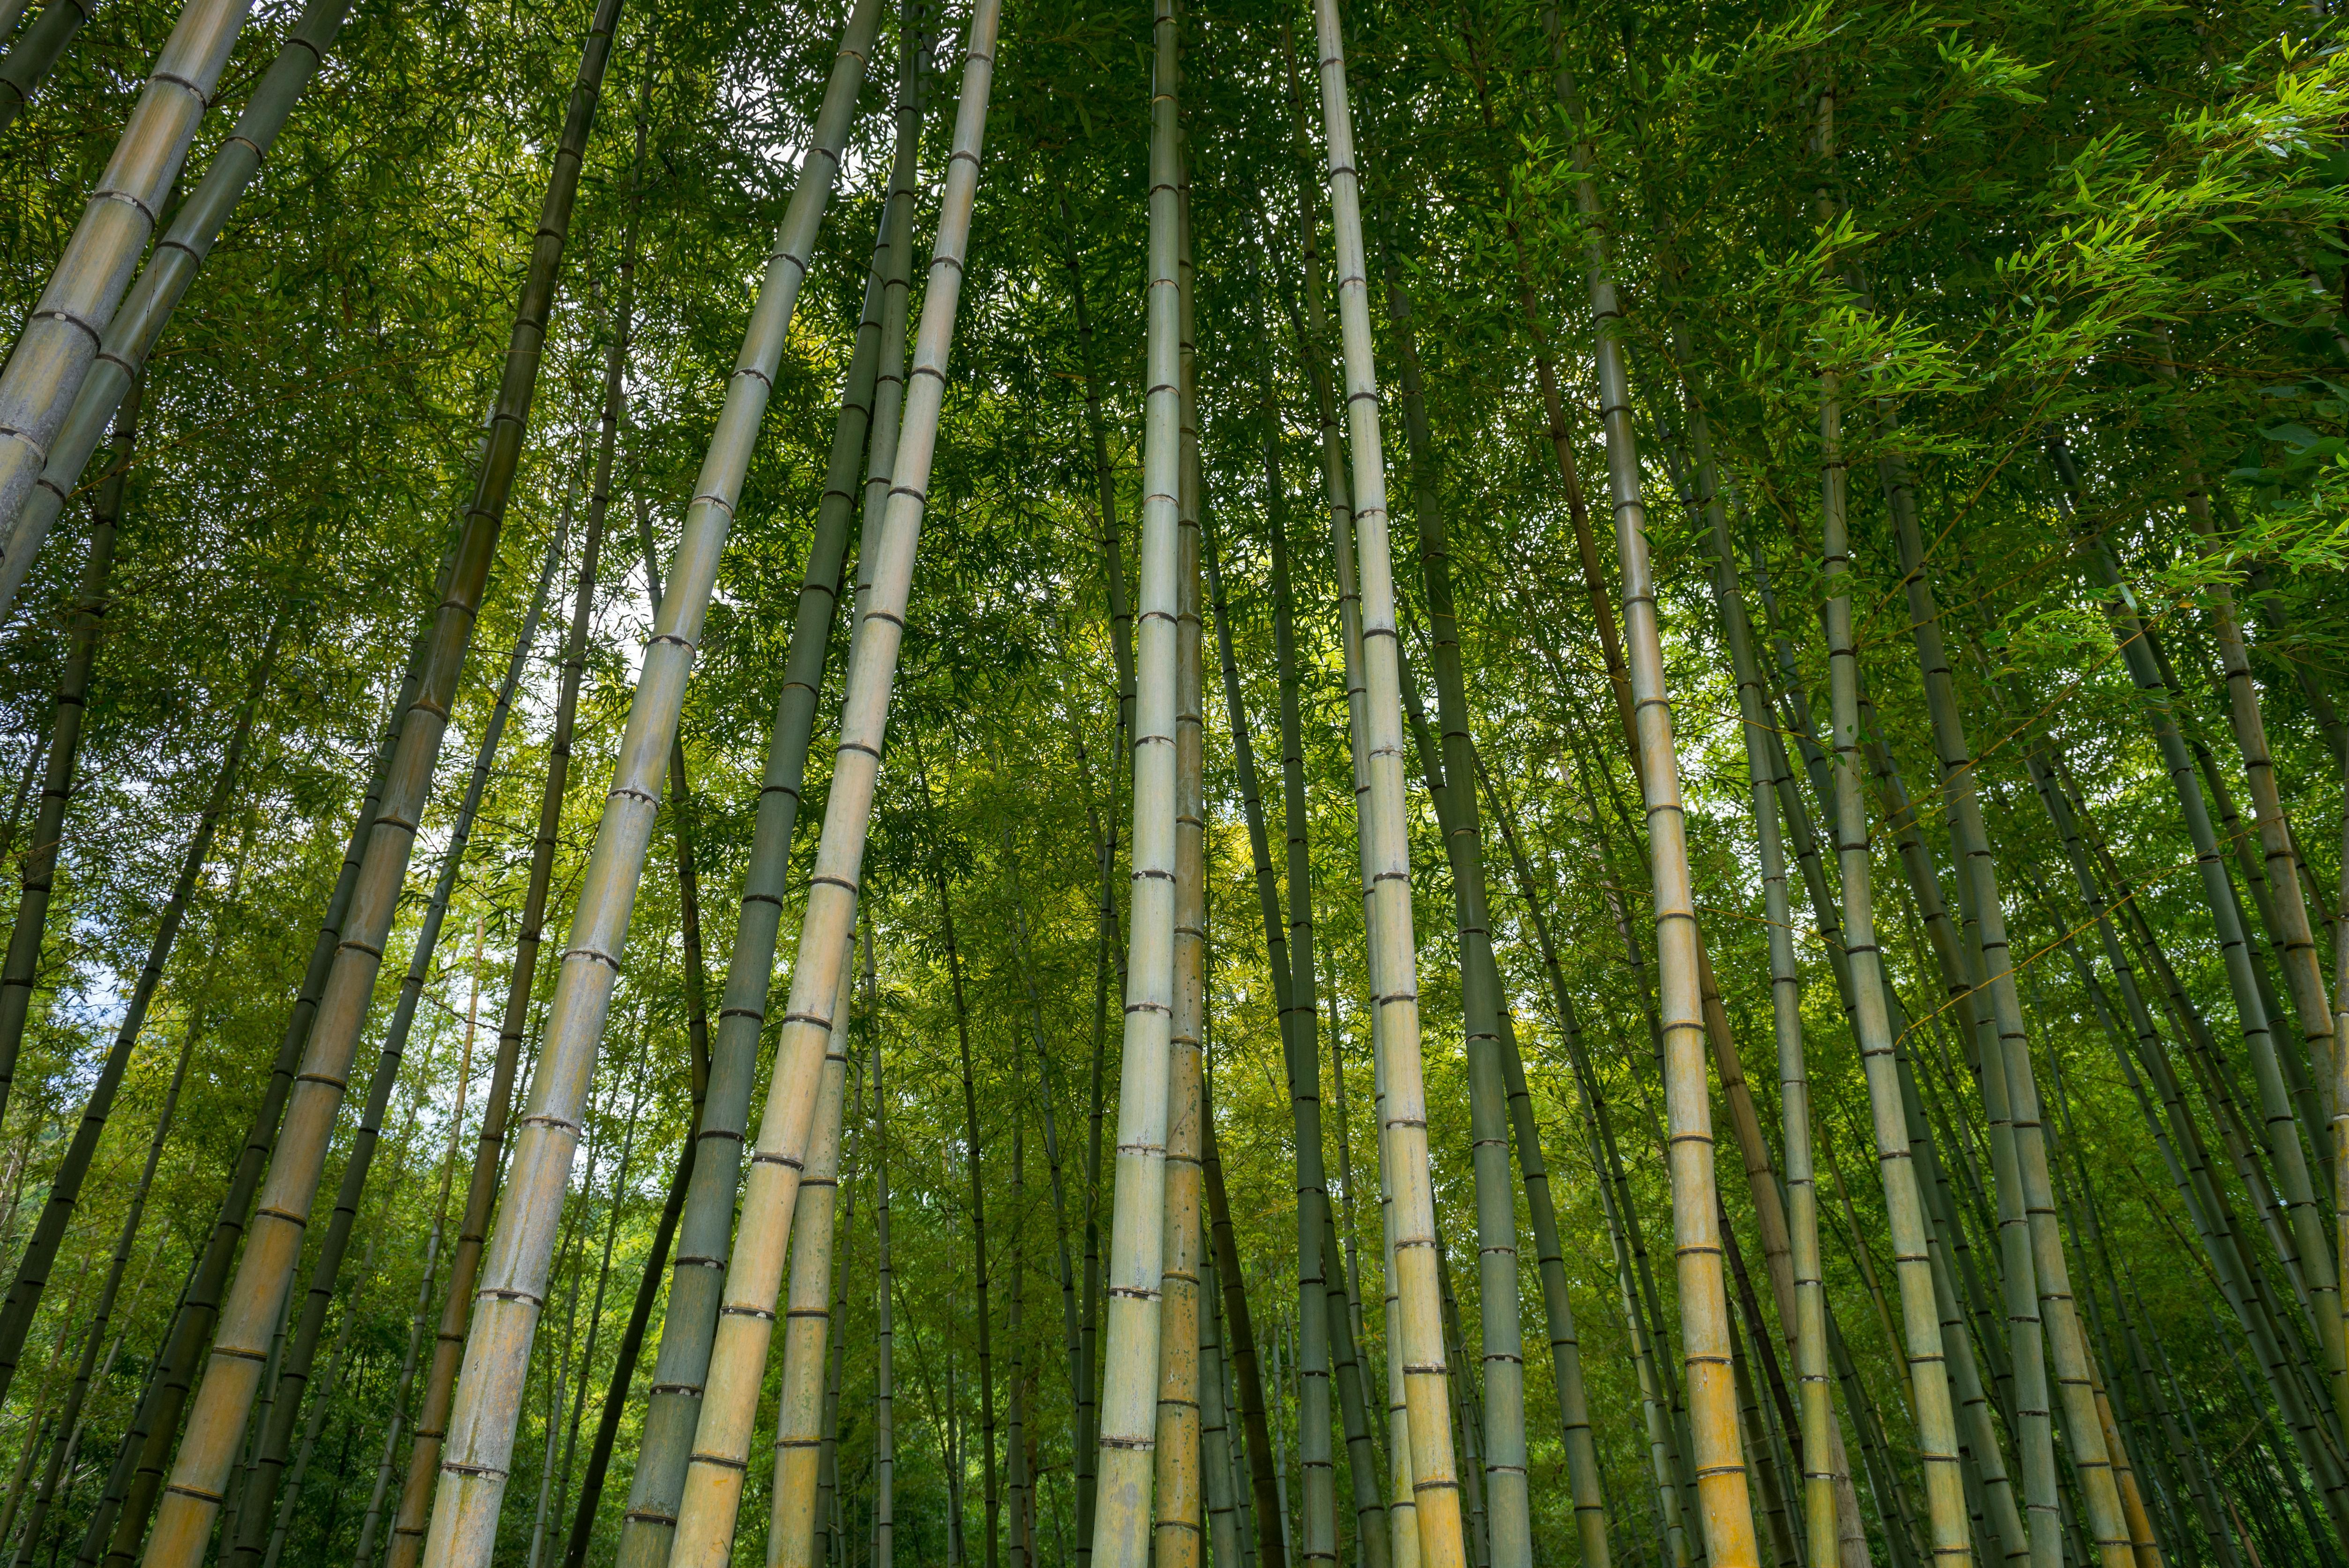 Bosque de bambú japonés